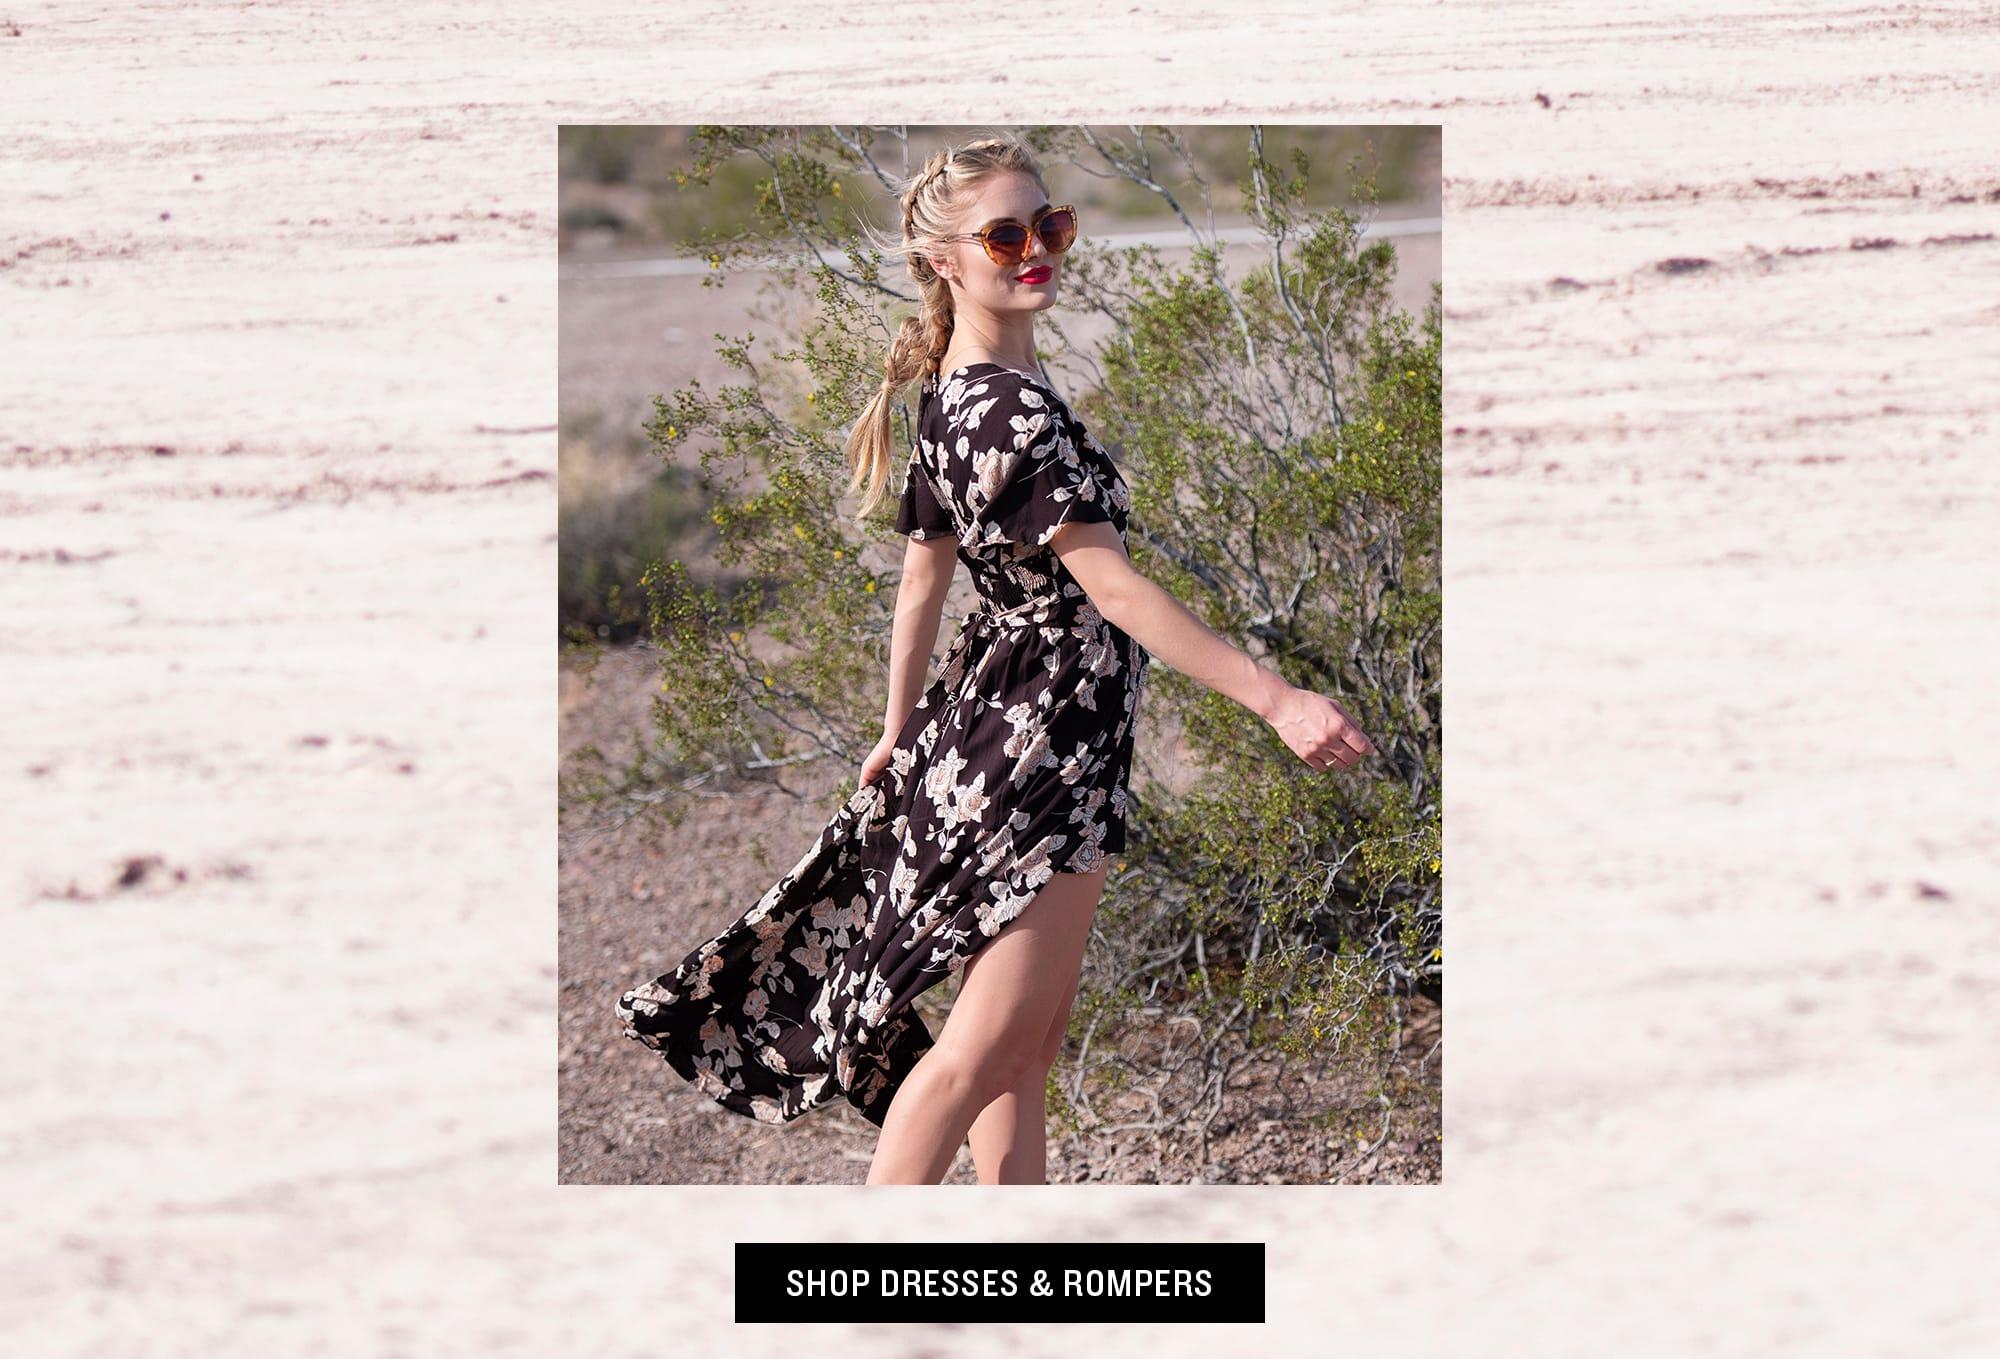 Shop Dresses & Rompers